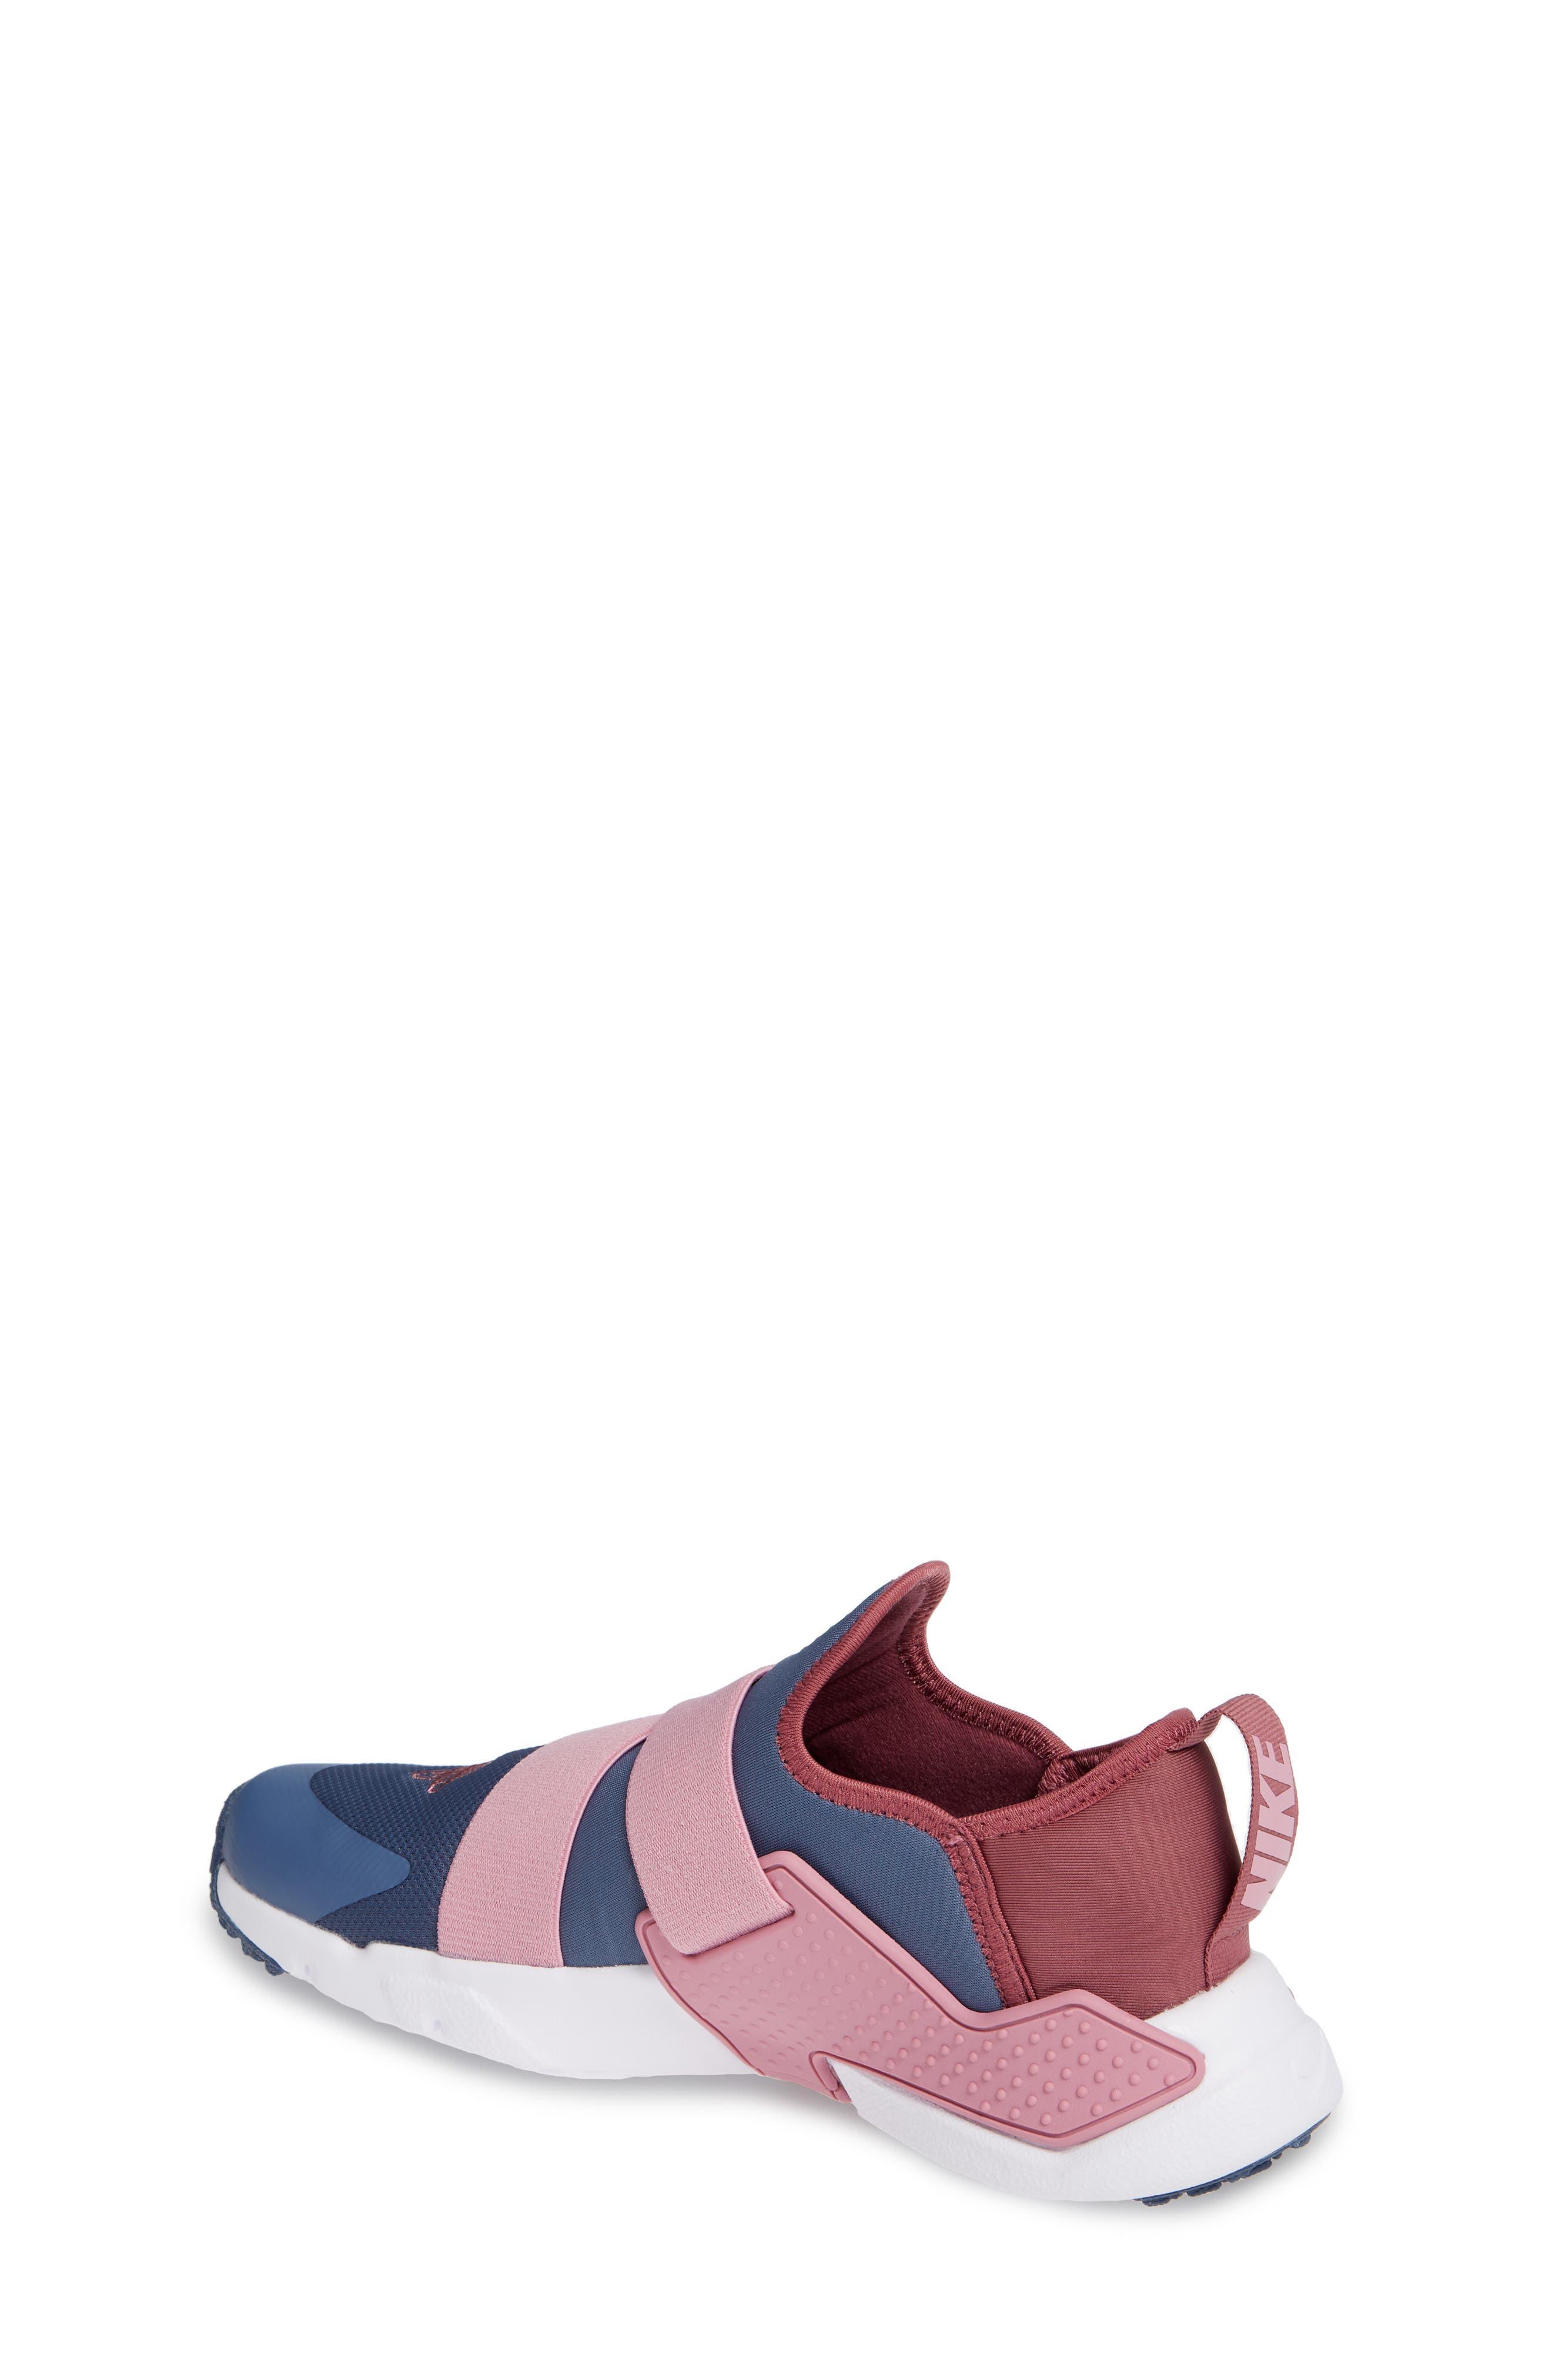 Huarache Extreme Sneaker,                             Alternate thumbnail 2, color,                             DIFFUSED BLUE